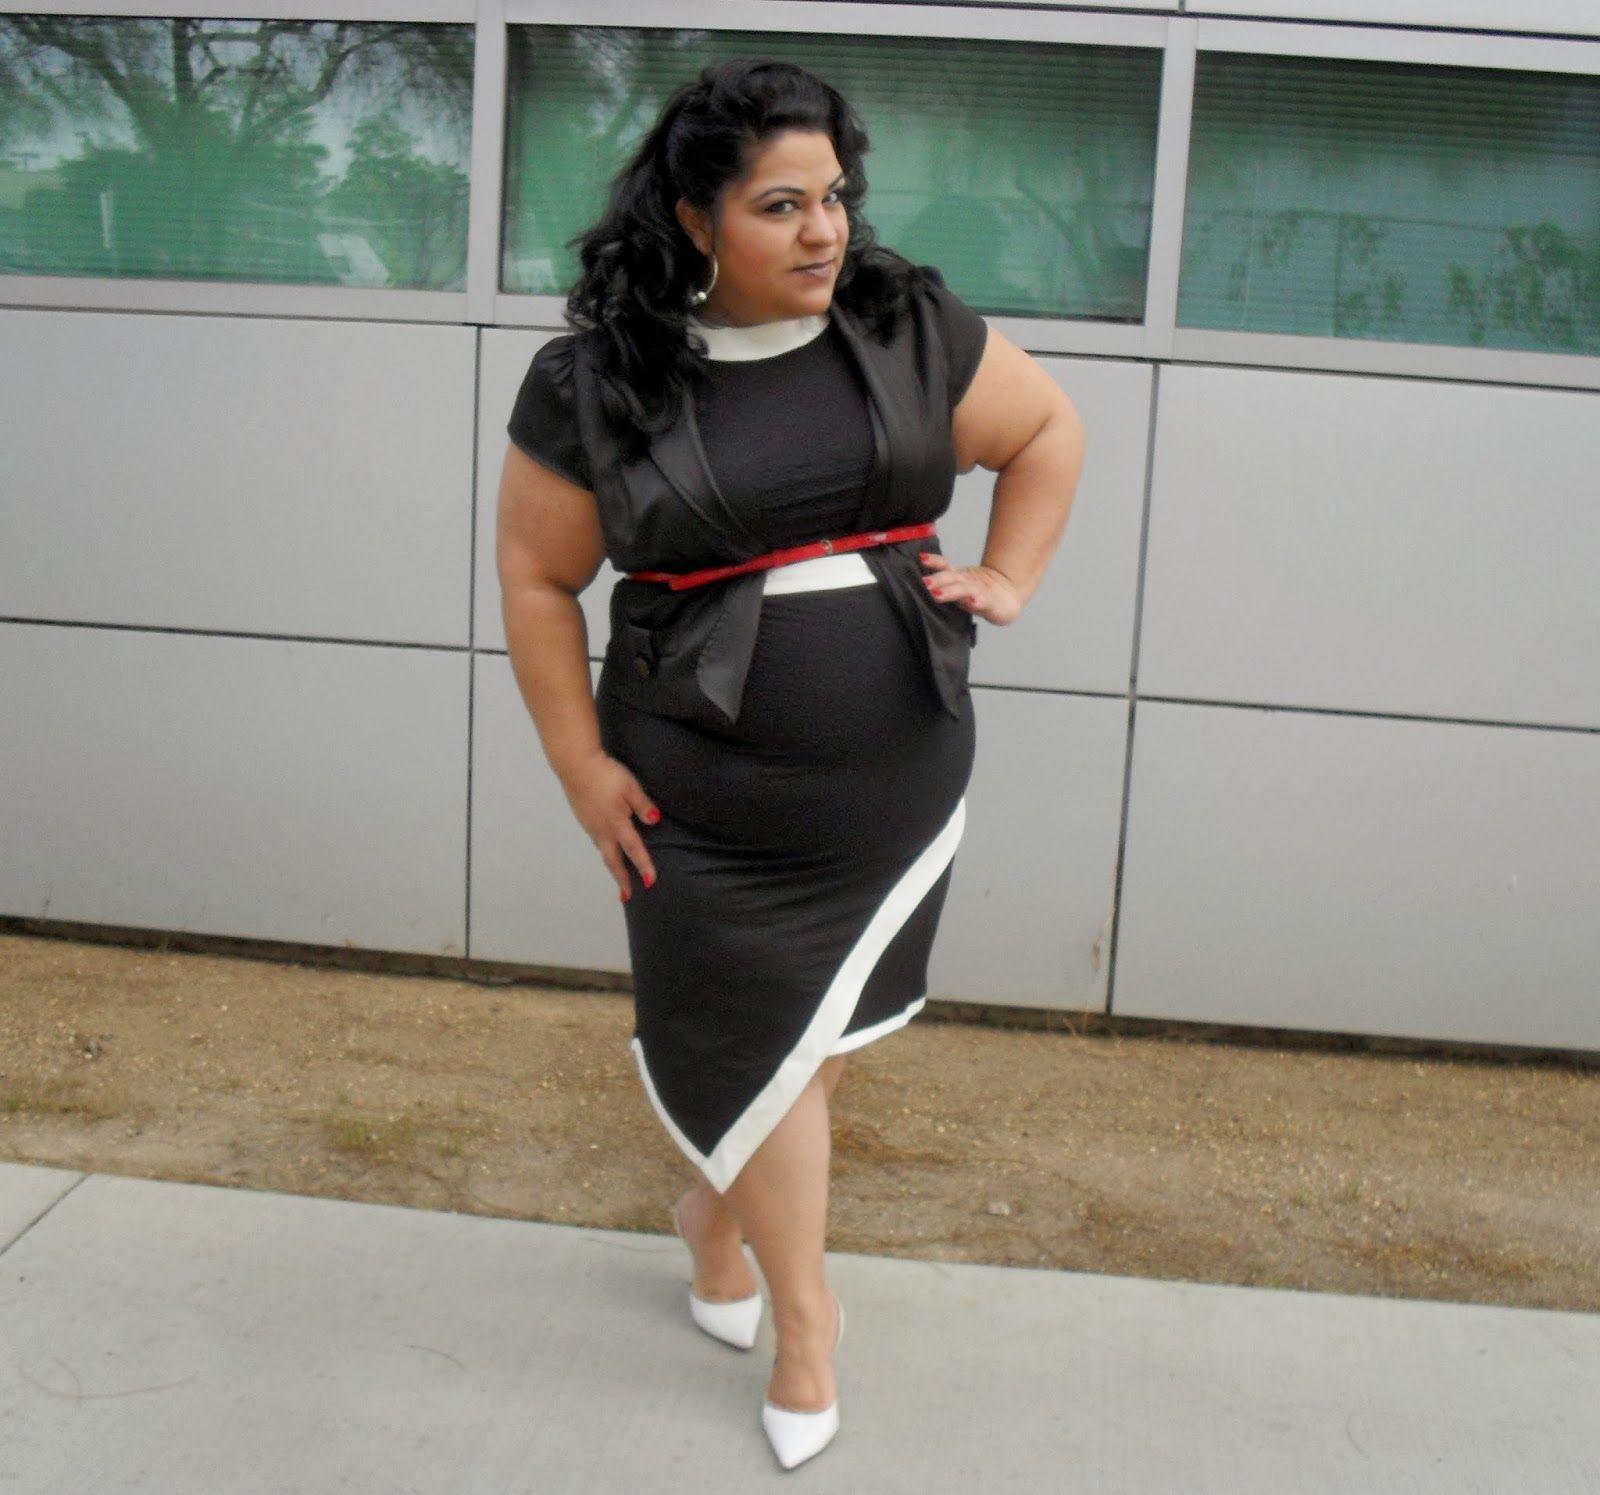 BBWGeneration: A-Symmetric Perfection - ASOS Curve Kleid (Outfit